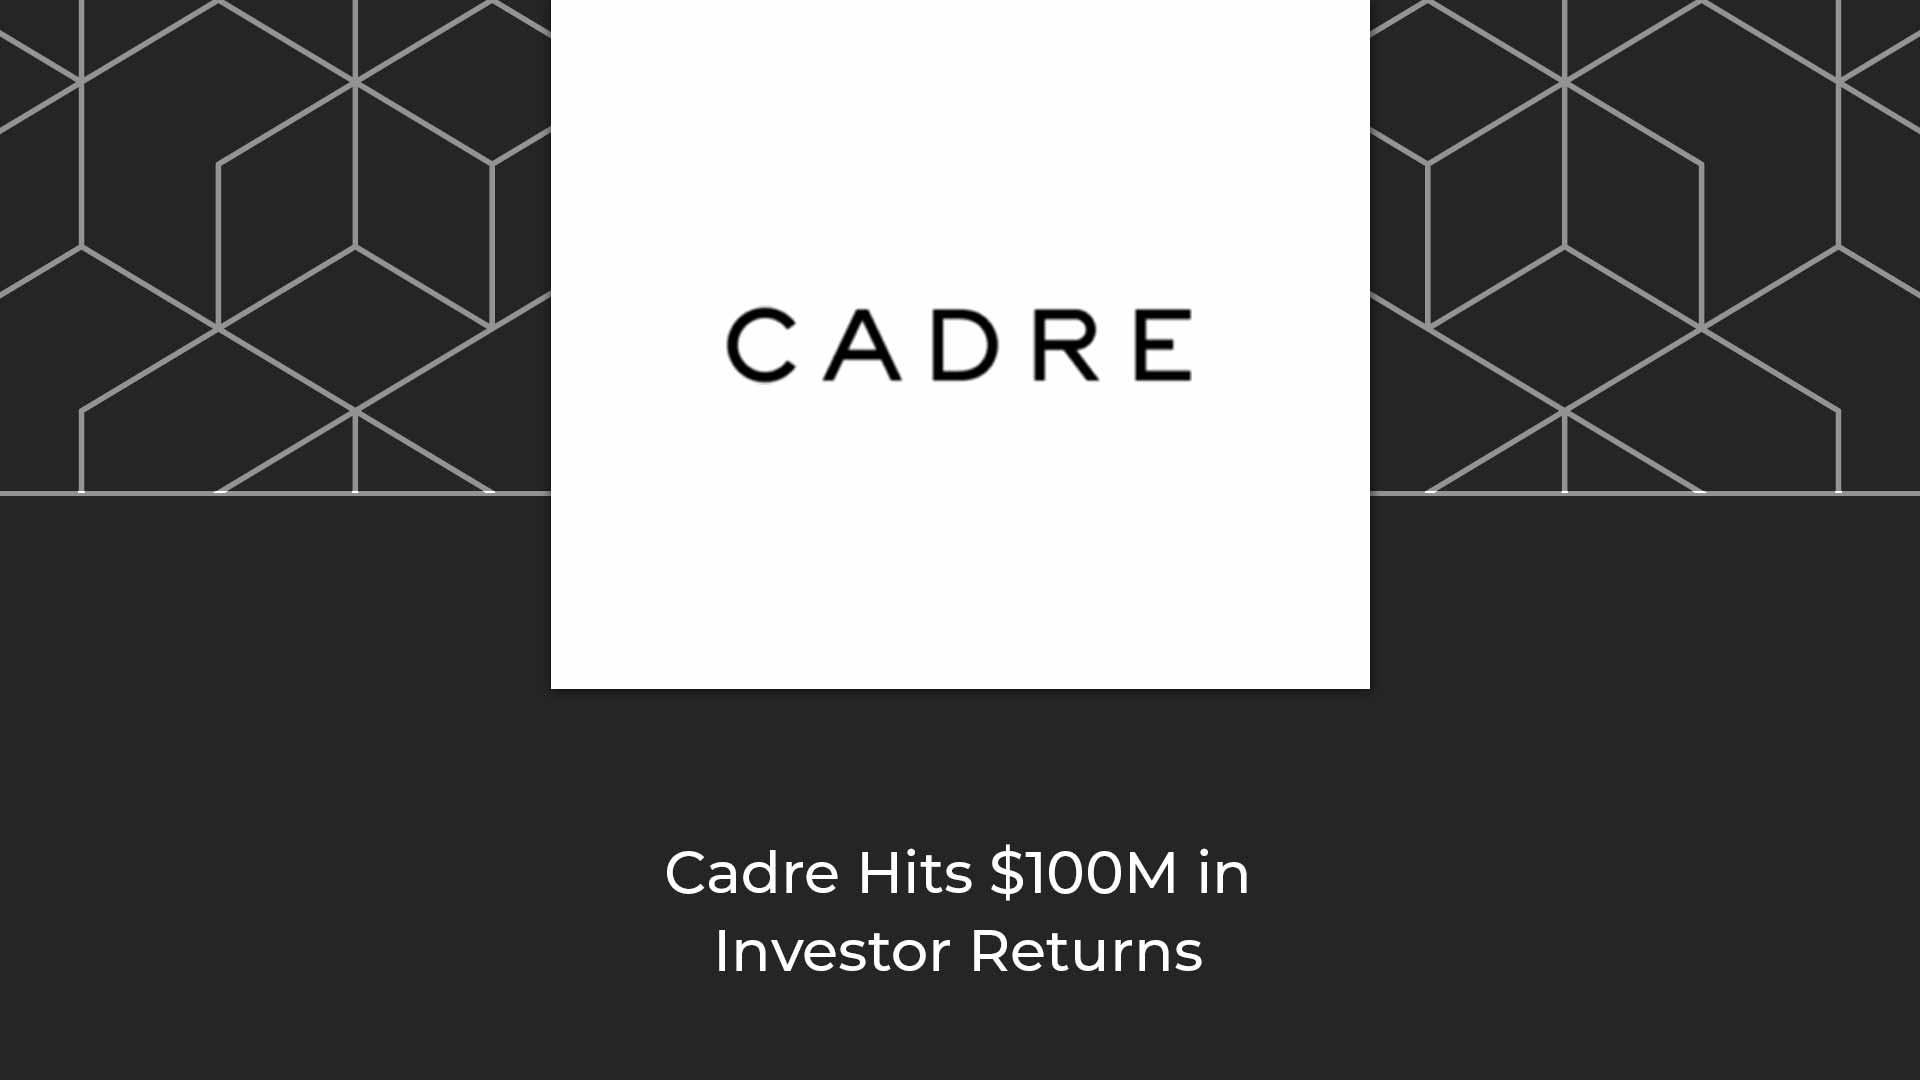 Cadre-Hits-$100M-in-Investor-Returns